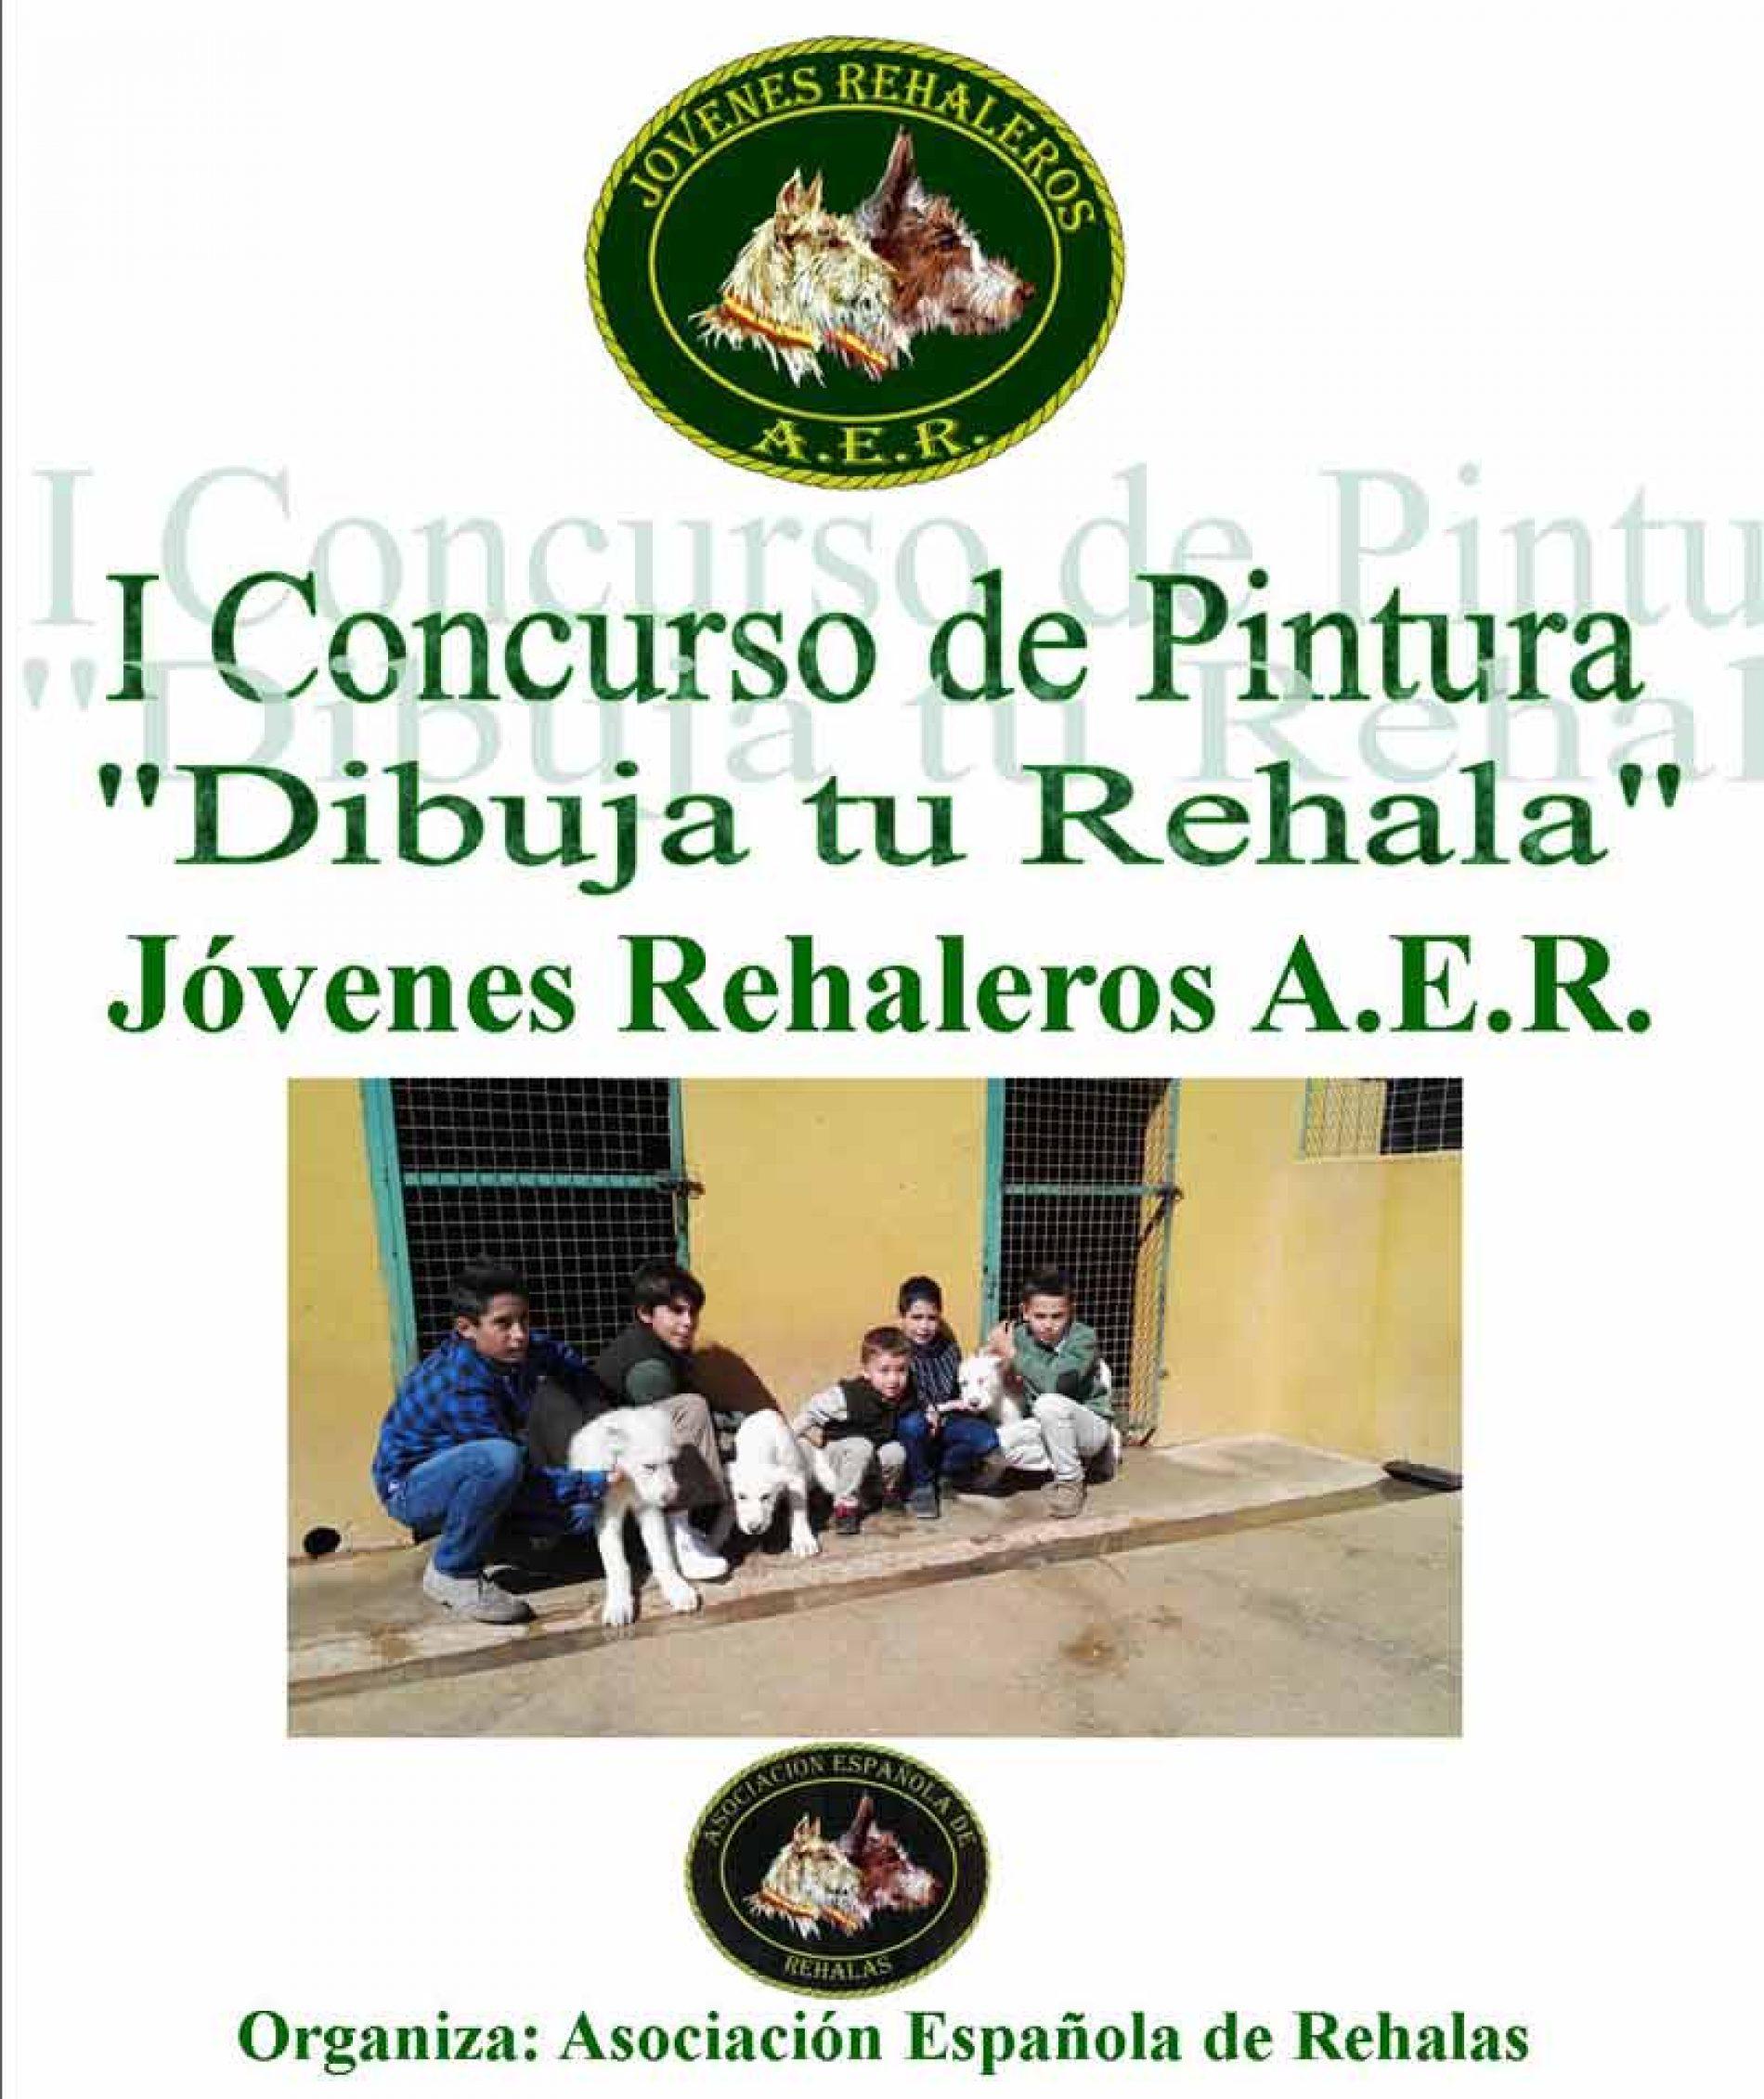 "I Concurso de Pintura ""Dibuja tu Rehala"". Jóvenes rehaleros A.E.R."